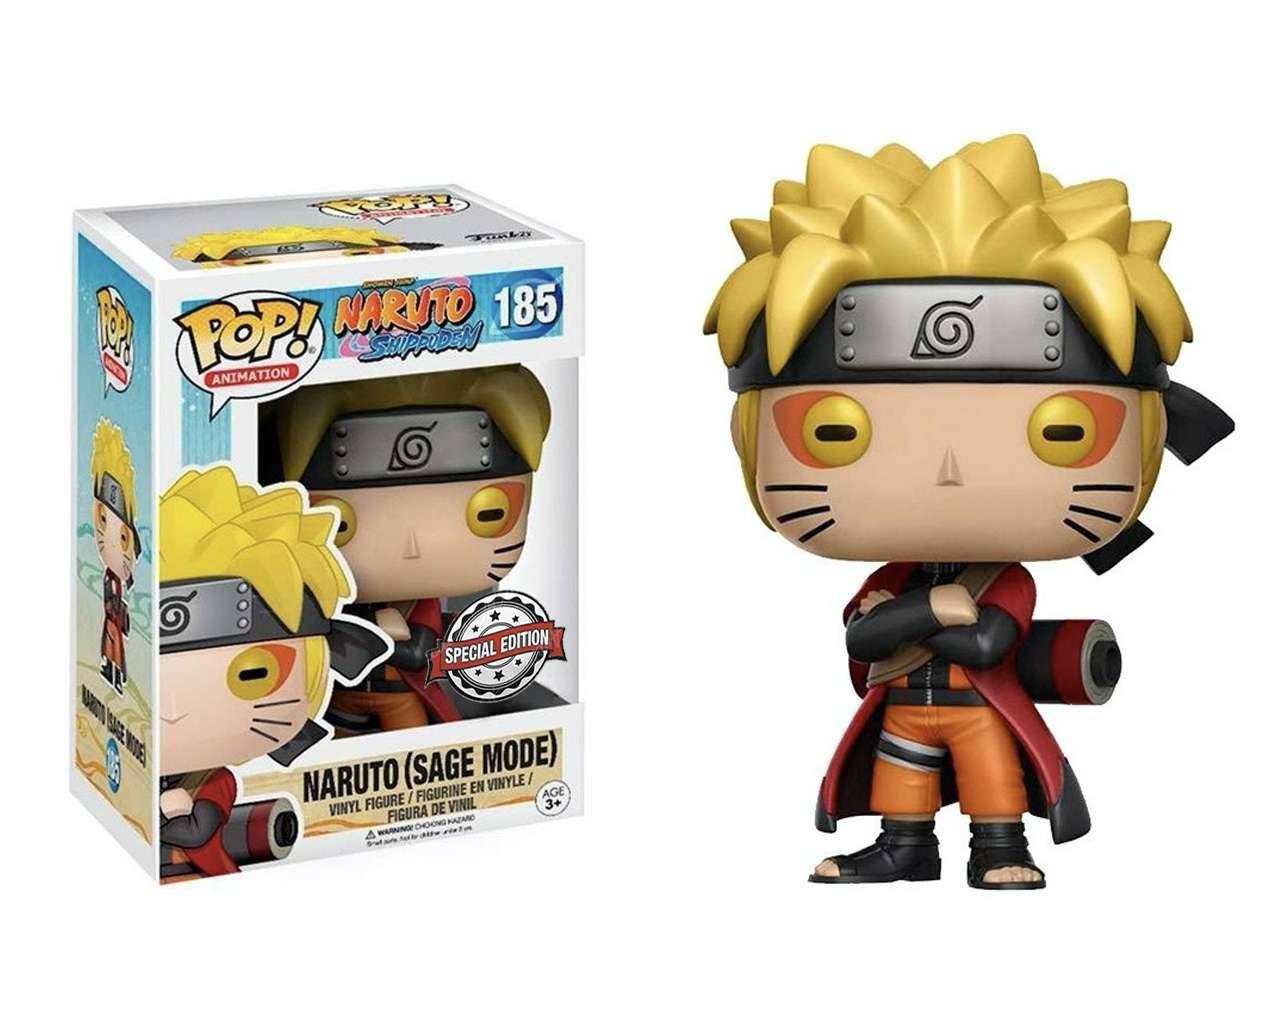 Naruto (Sage Mode) Pop! Vinyl